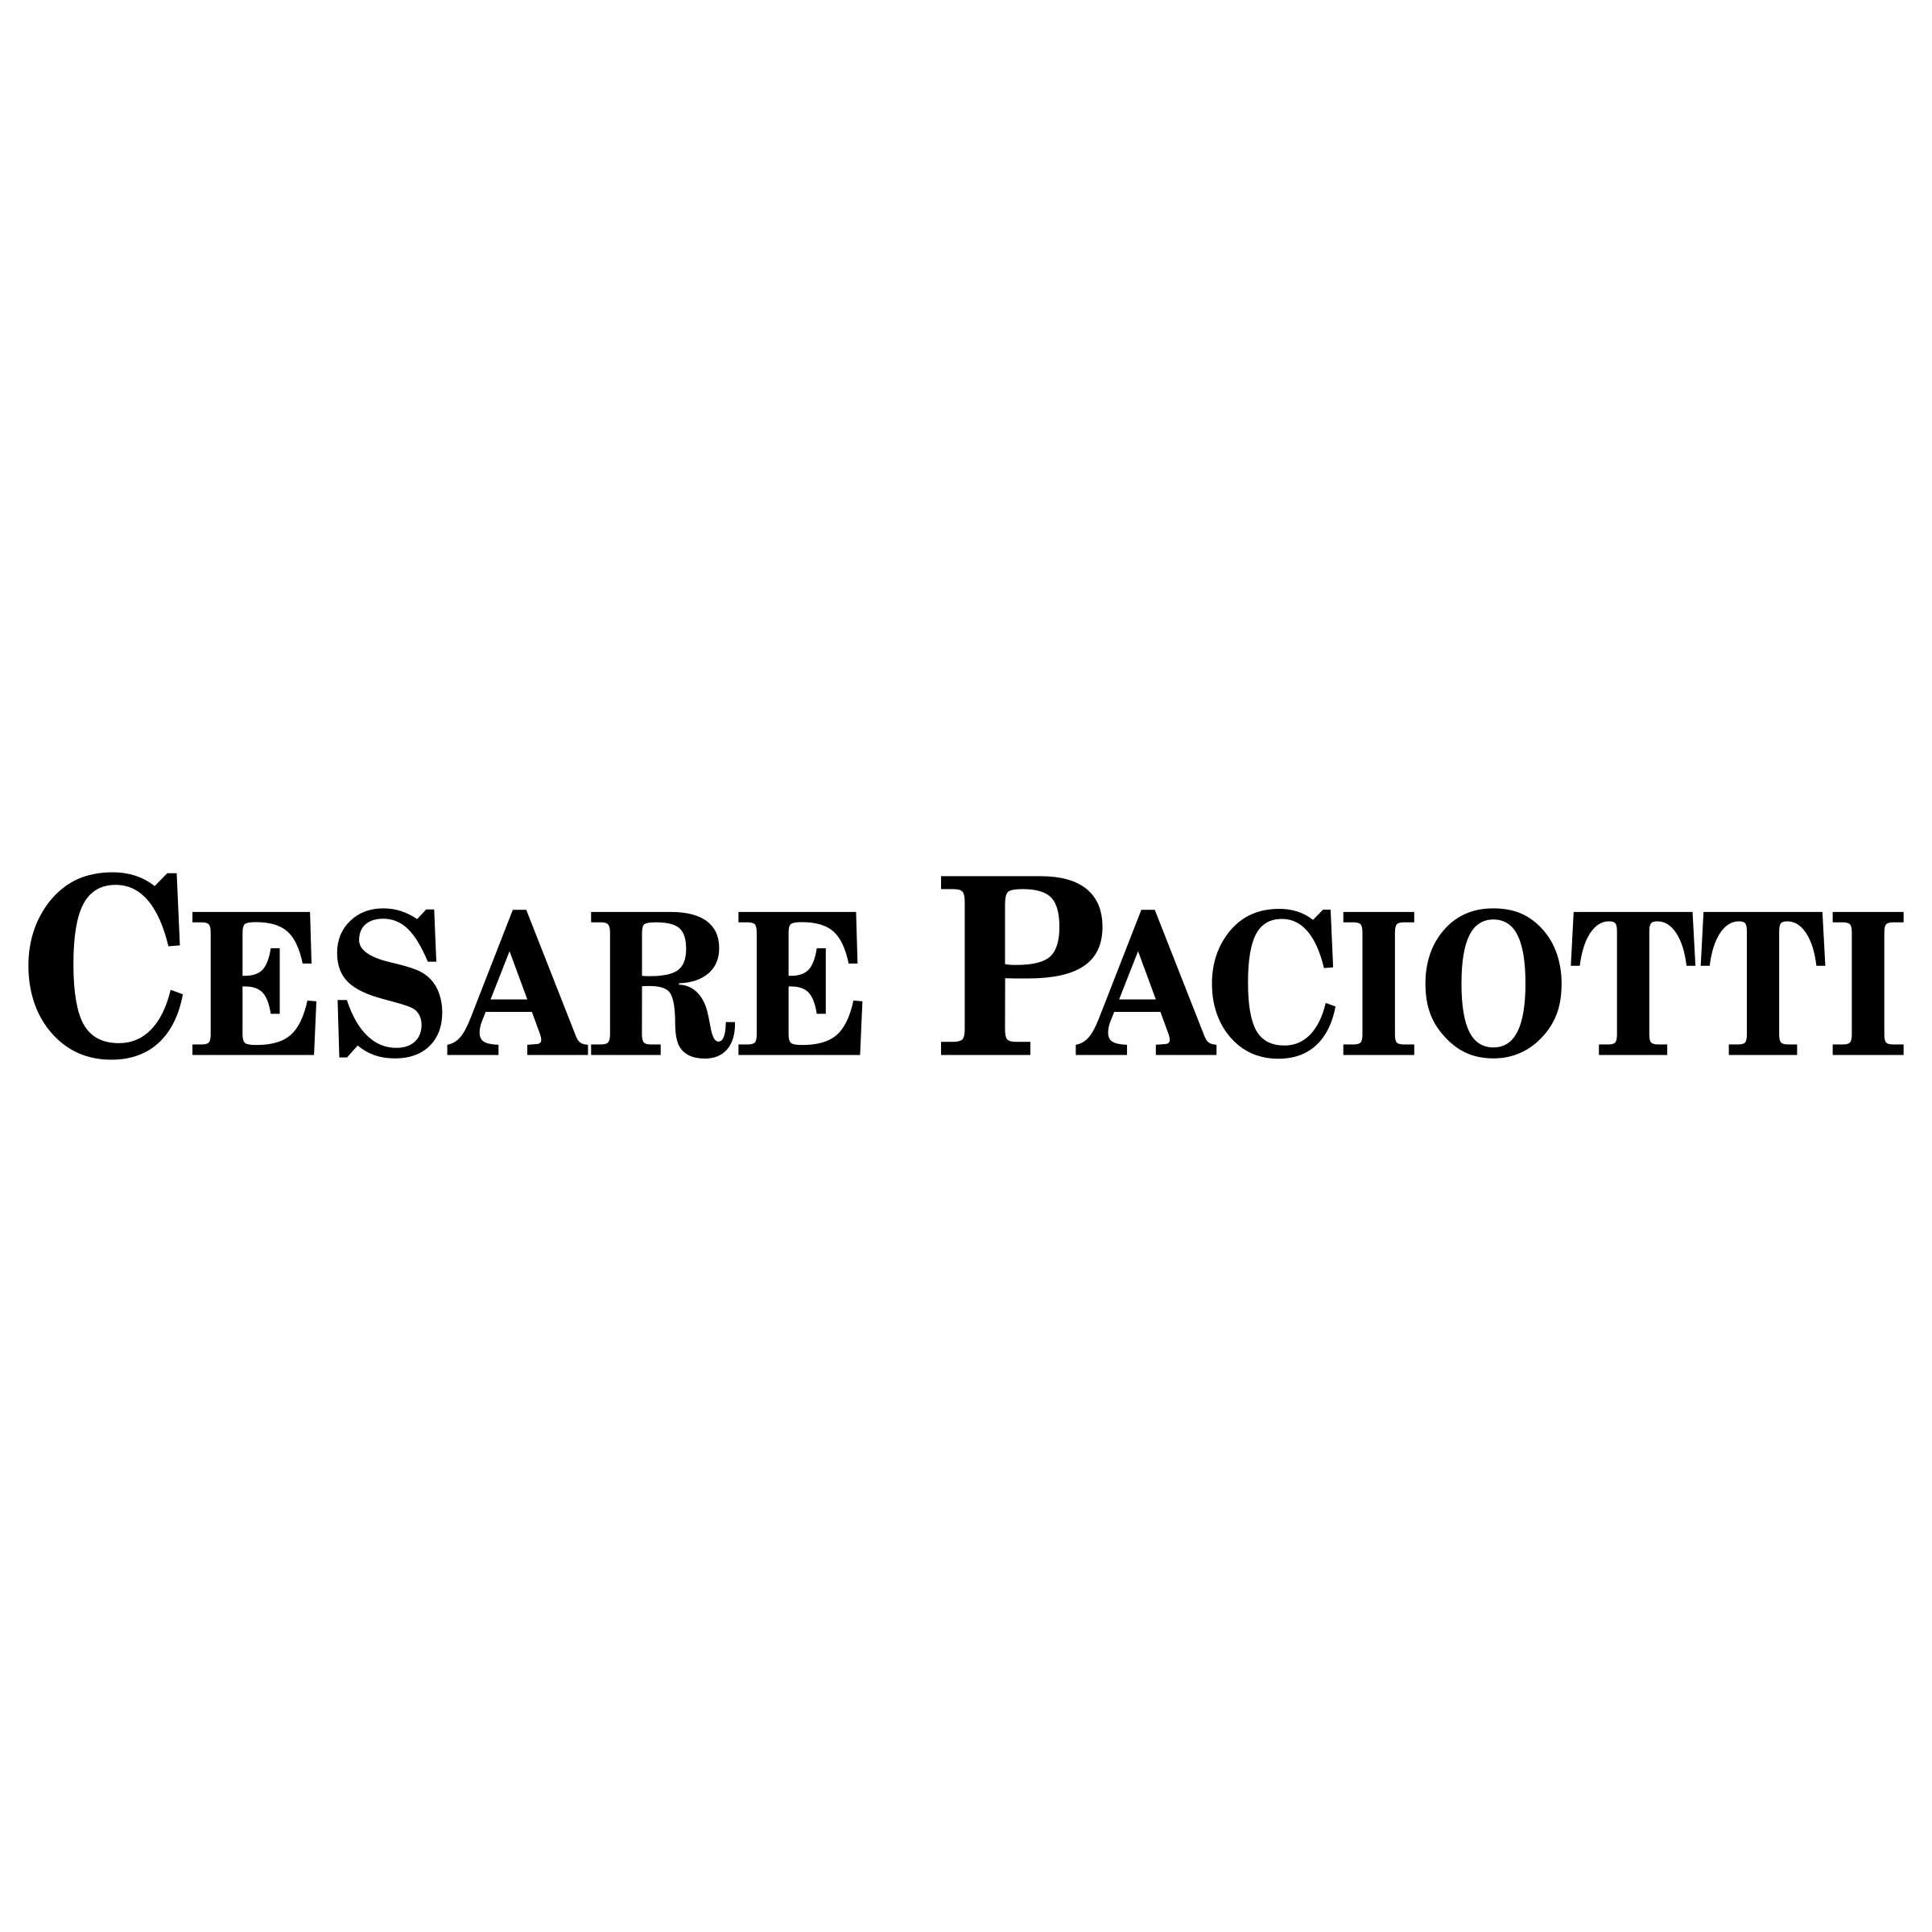 paciotti